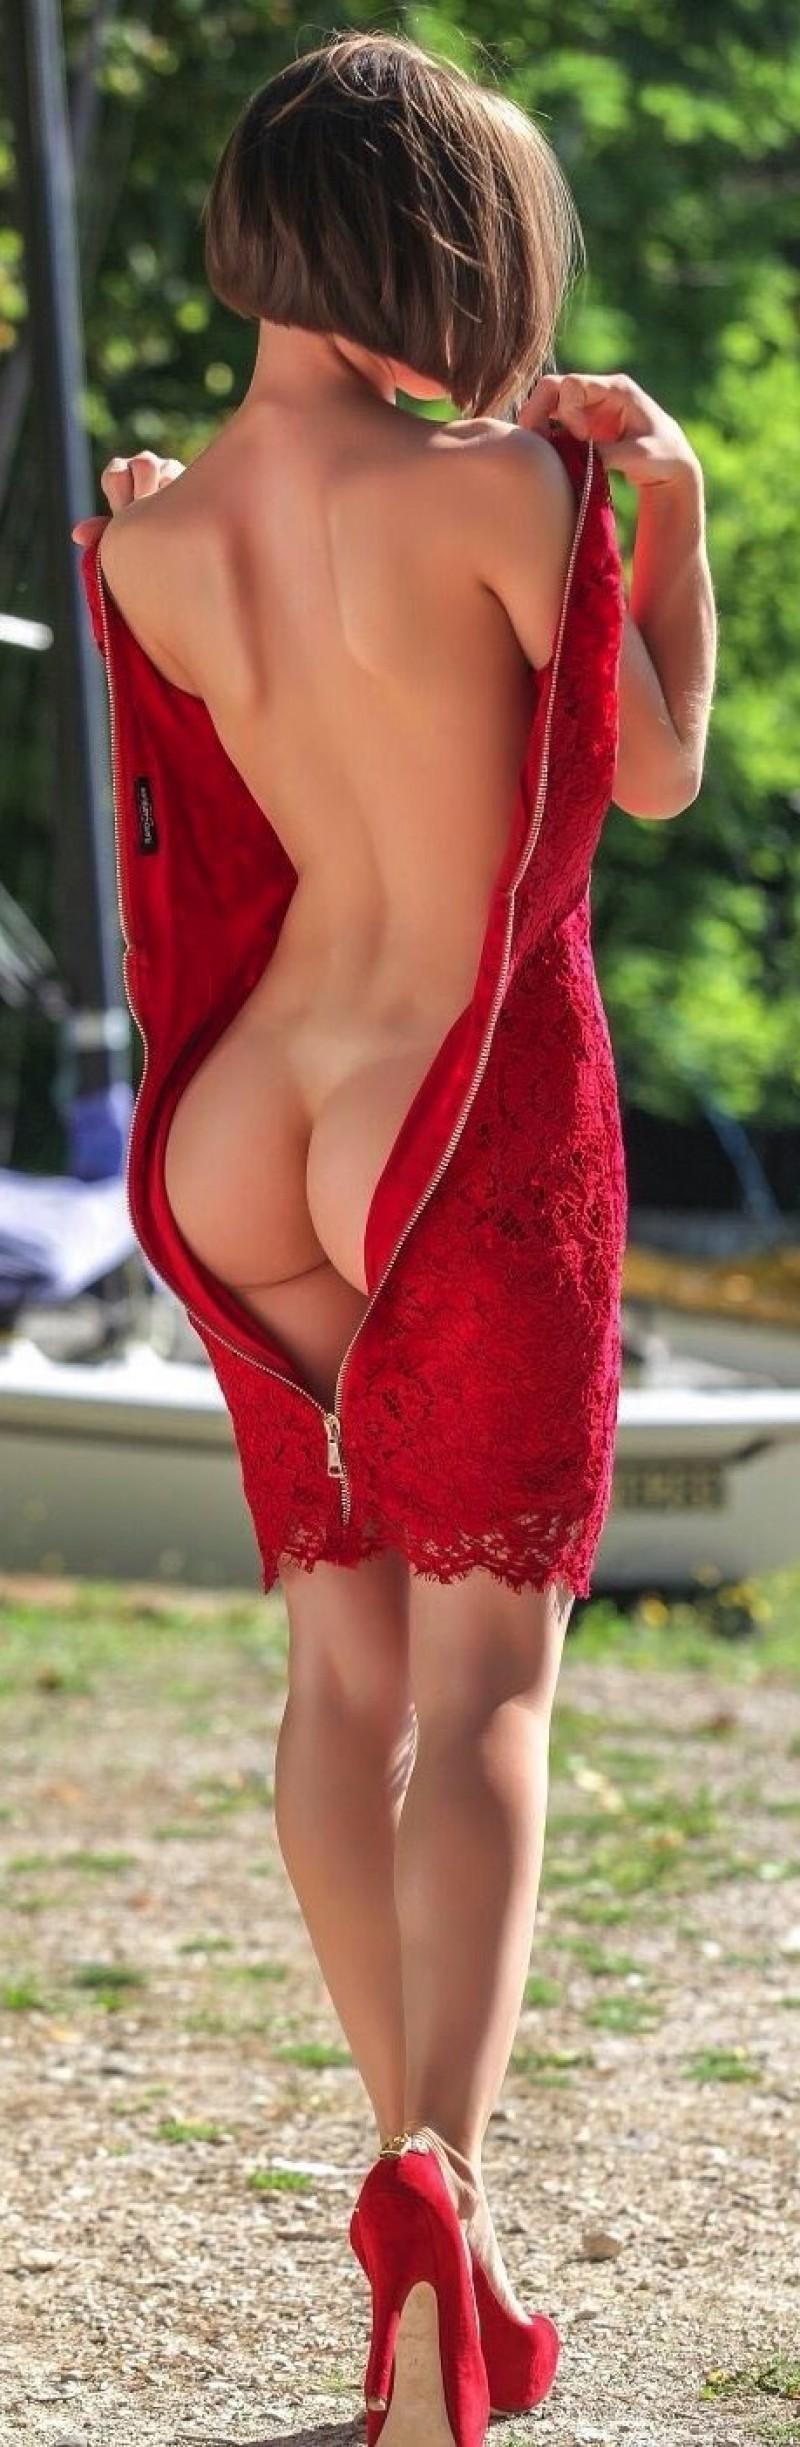 ebony beauty double penetrated big cocks at yoga class #threesome #analsex #ass #legs #heels #mmf